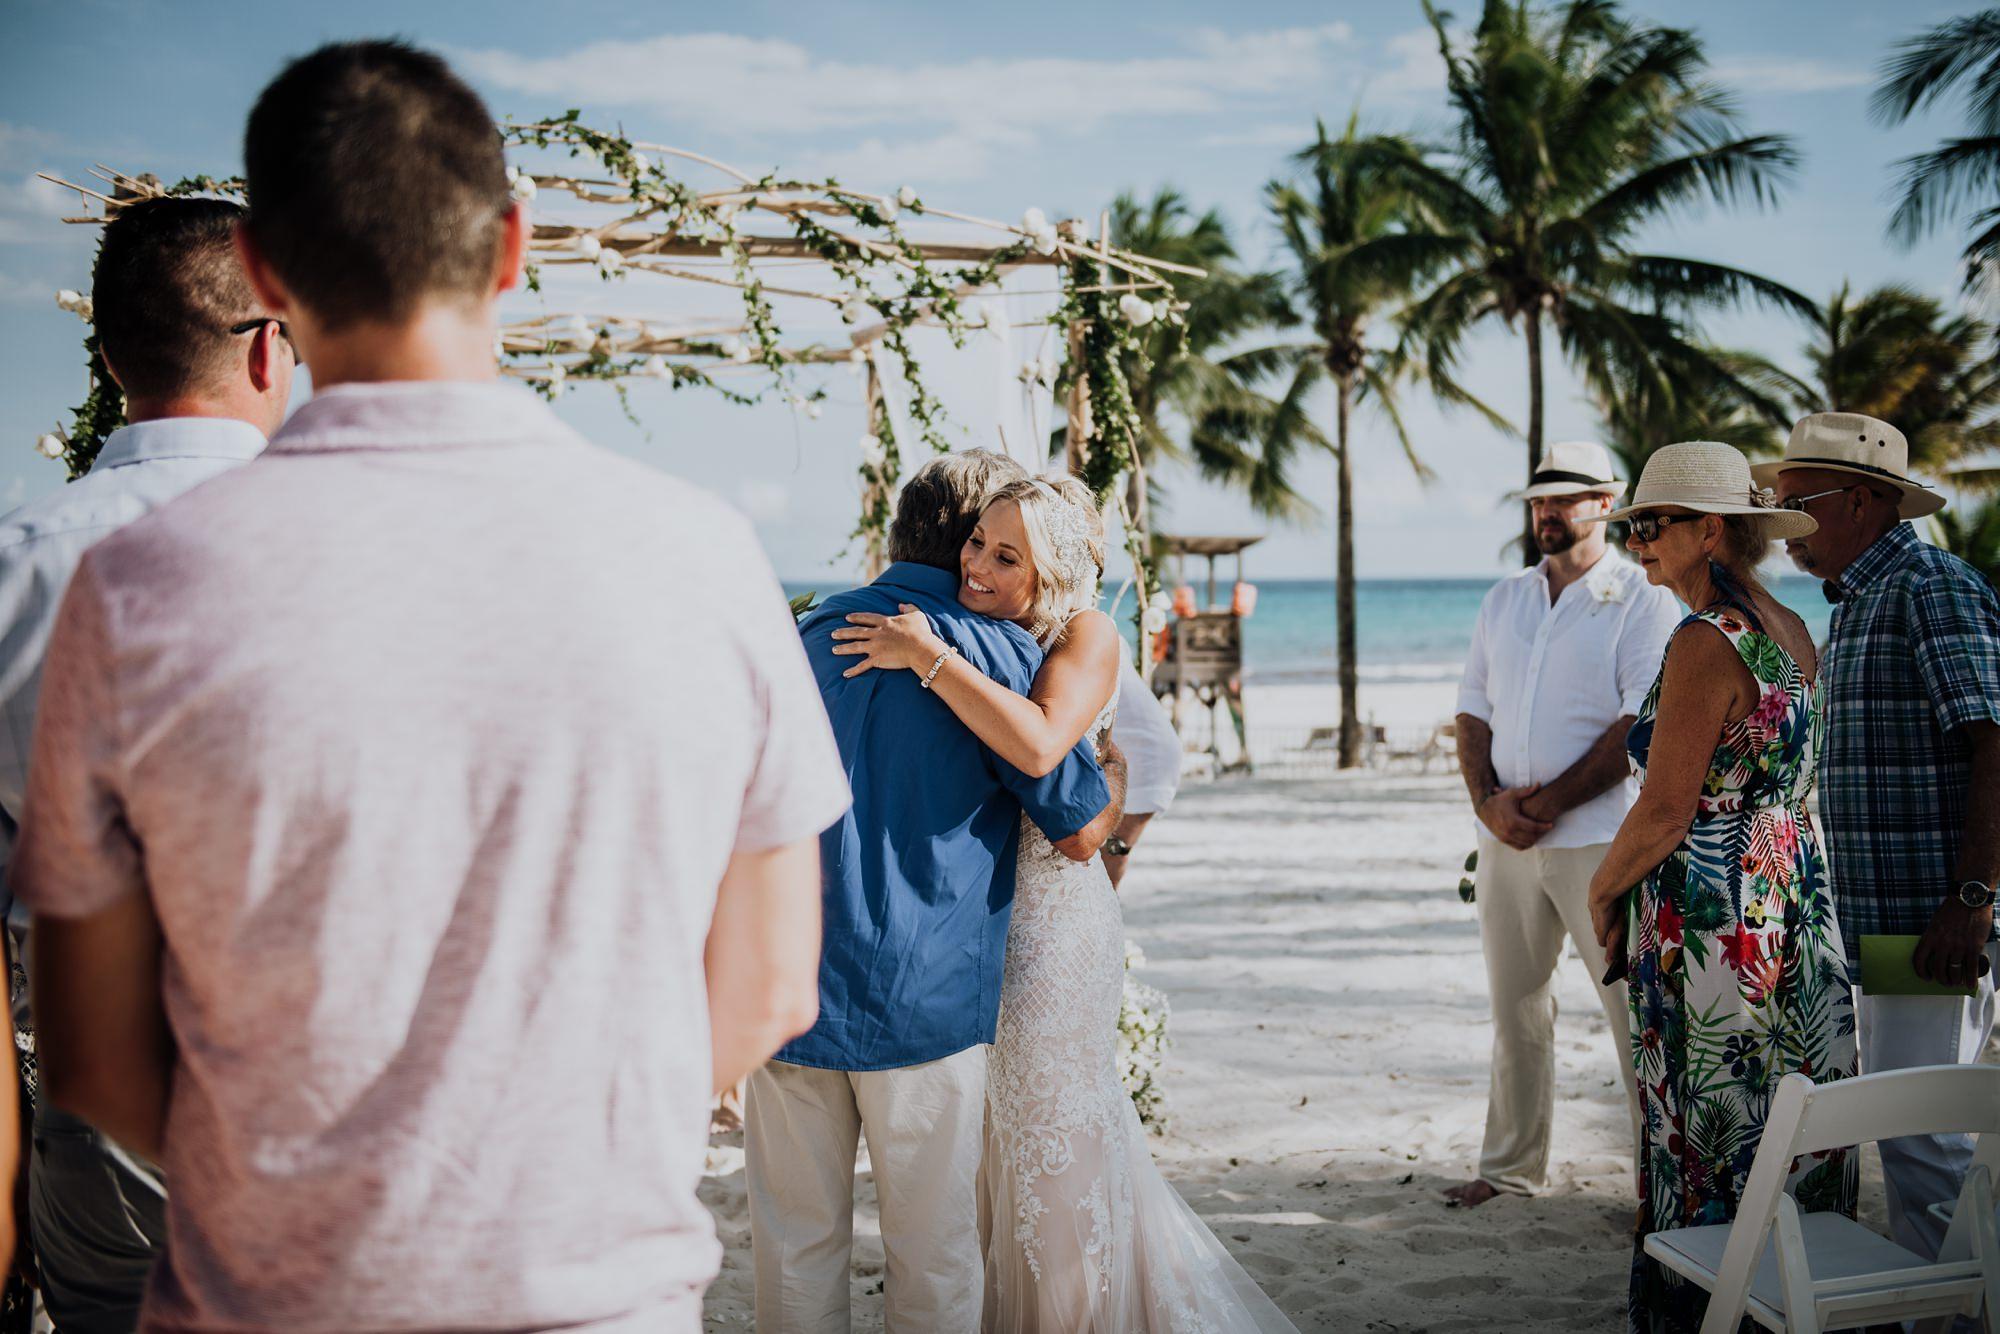 bride and father hug beach wedding ceremony bride and groom exit beach wedding ceremony at mexico hotel Riu Palace Riviera Maya